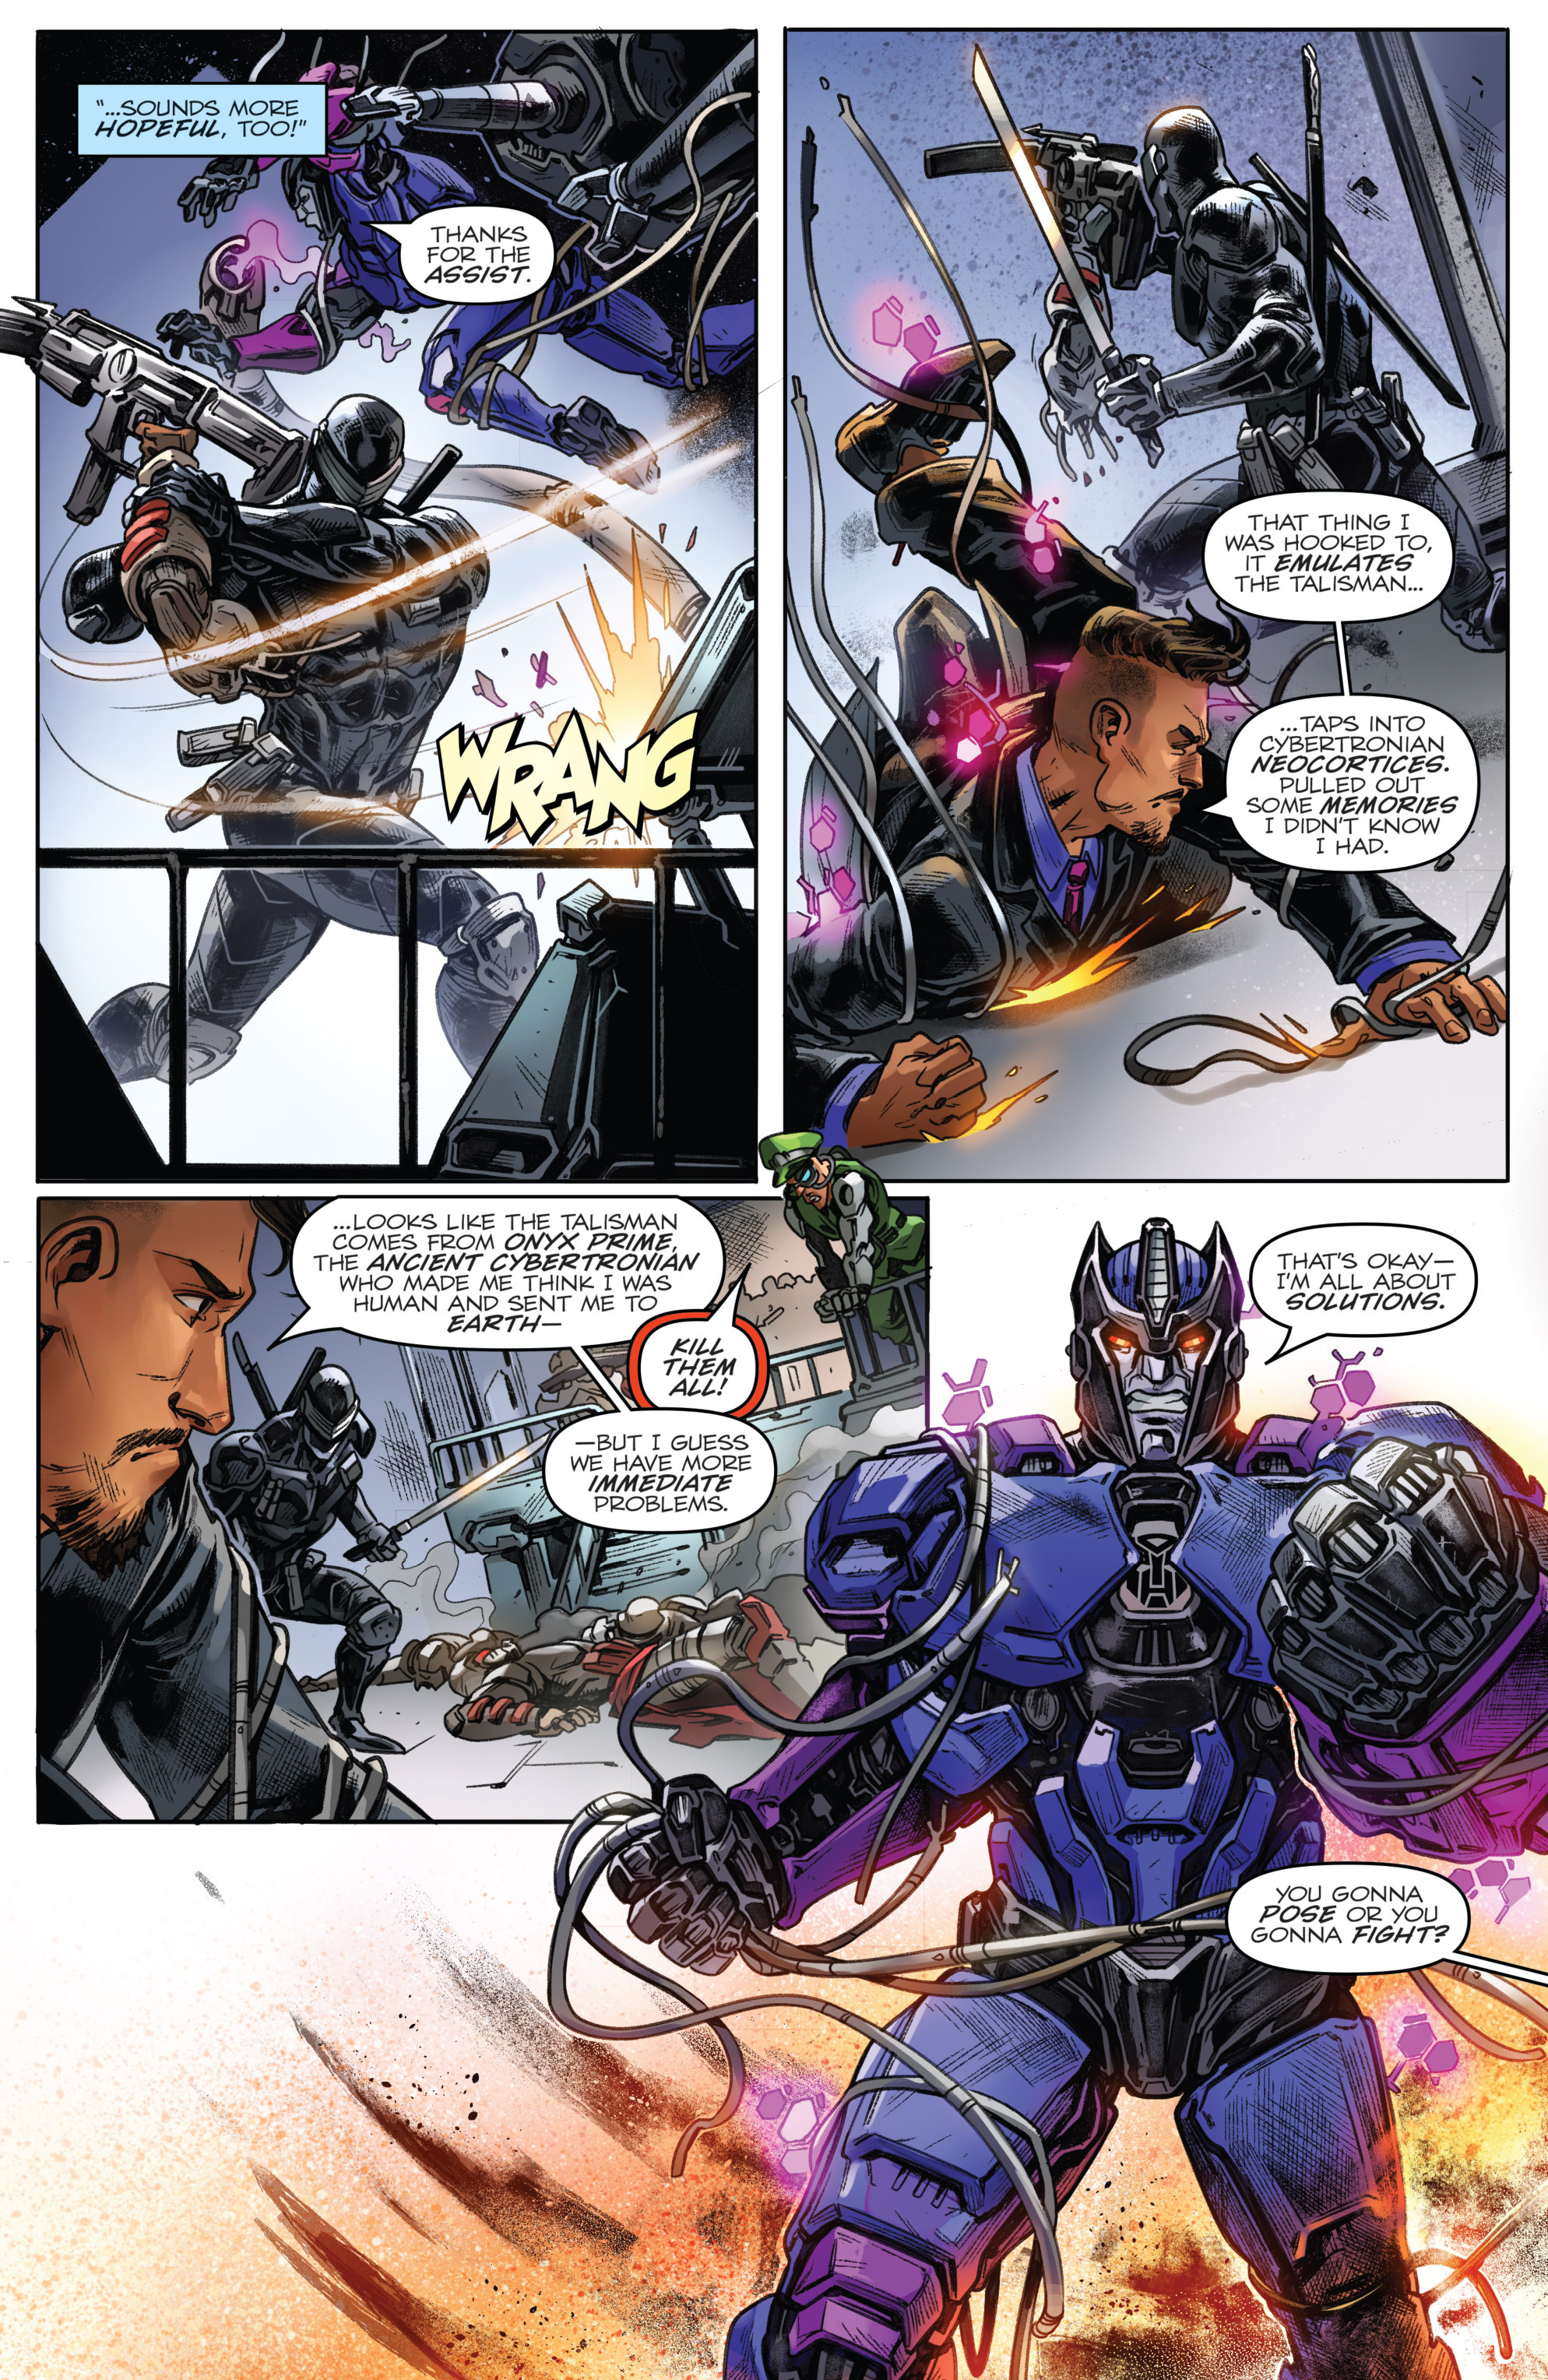 Read online Revolutionaries comic -  Issue #4 - 18